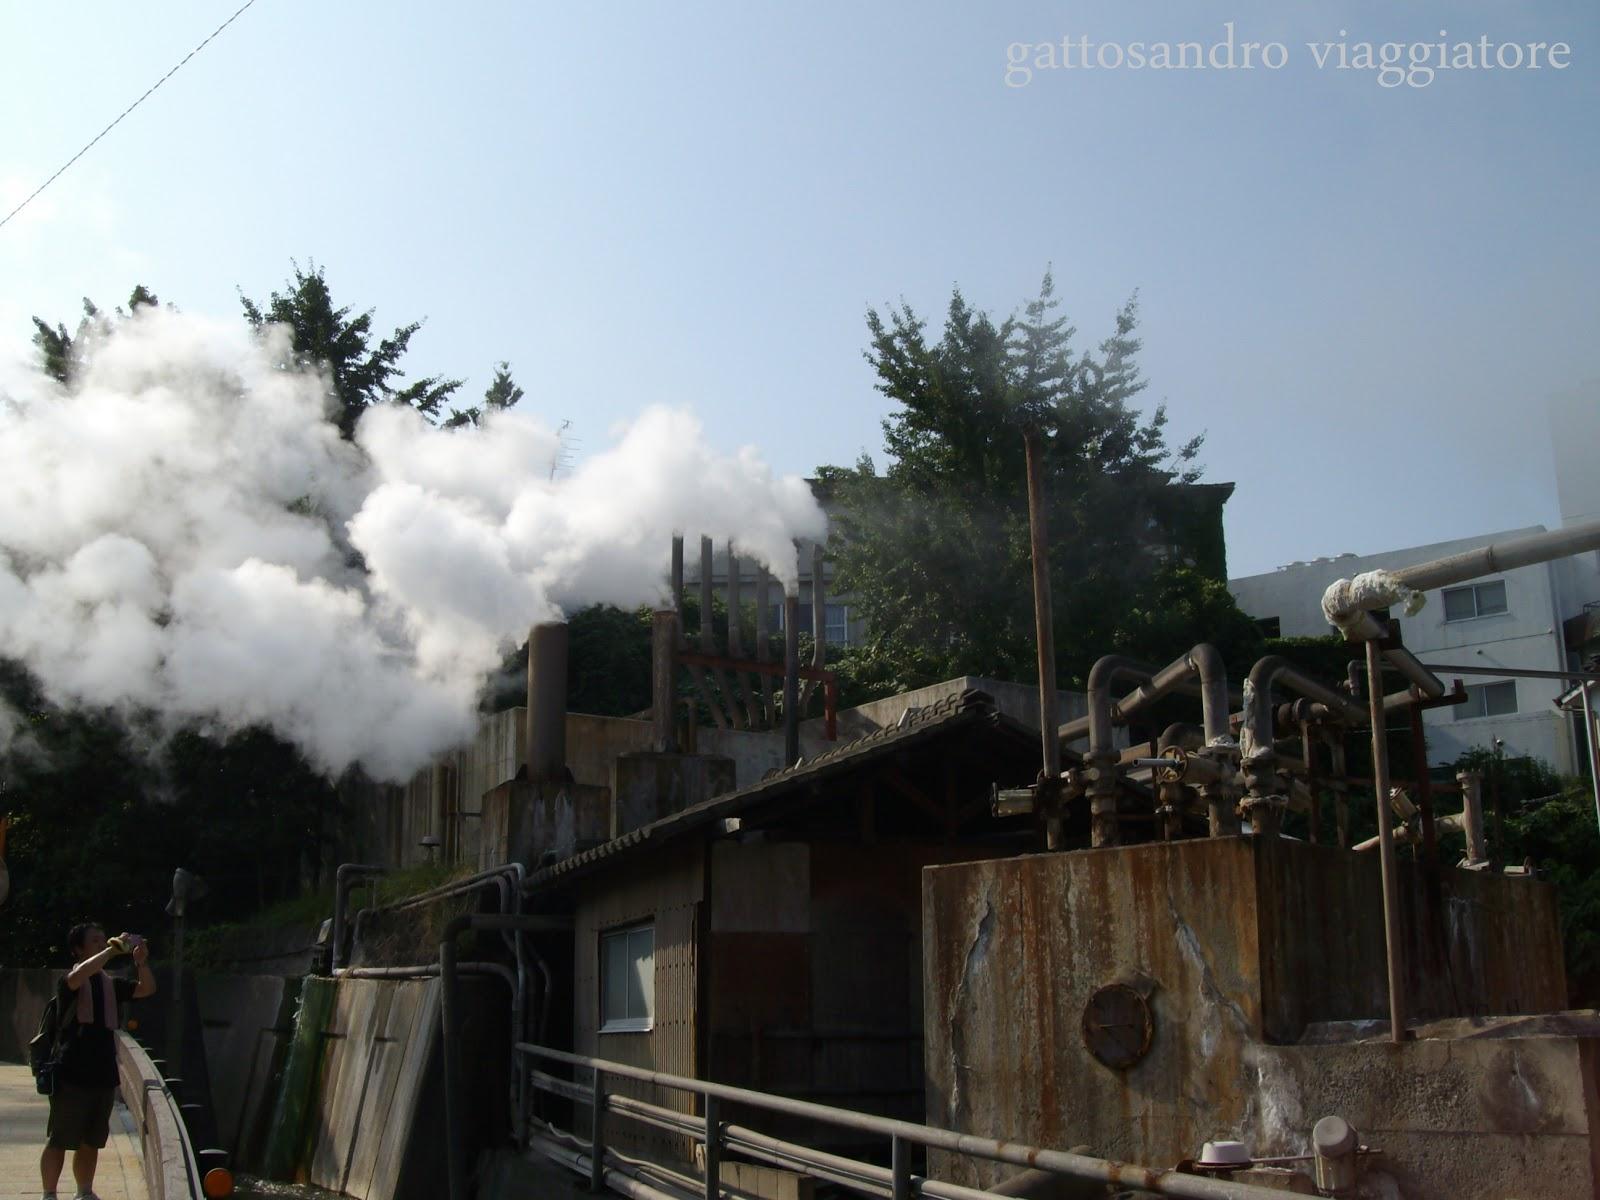 Gattosandro viaggiatore travel blog le 5 citt for Tetti giapponesi